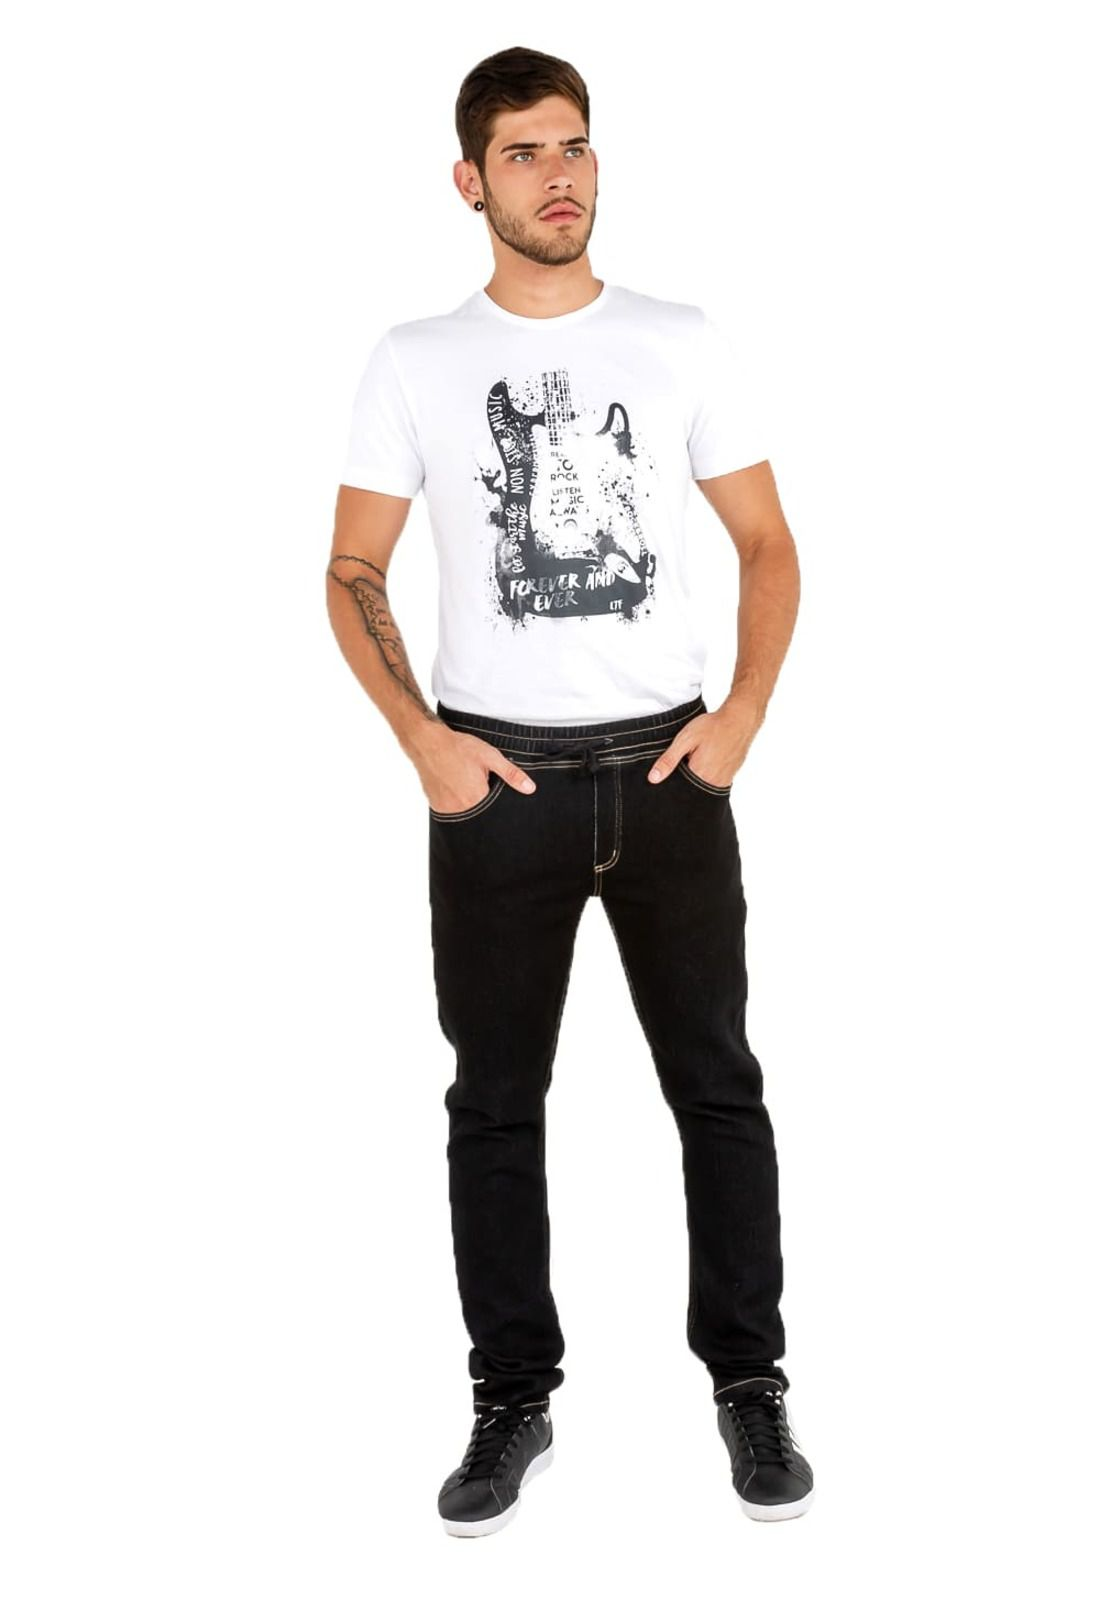 Calça Jeans Masculina Latifundio Jogger Preto